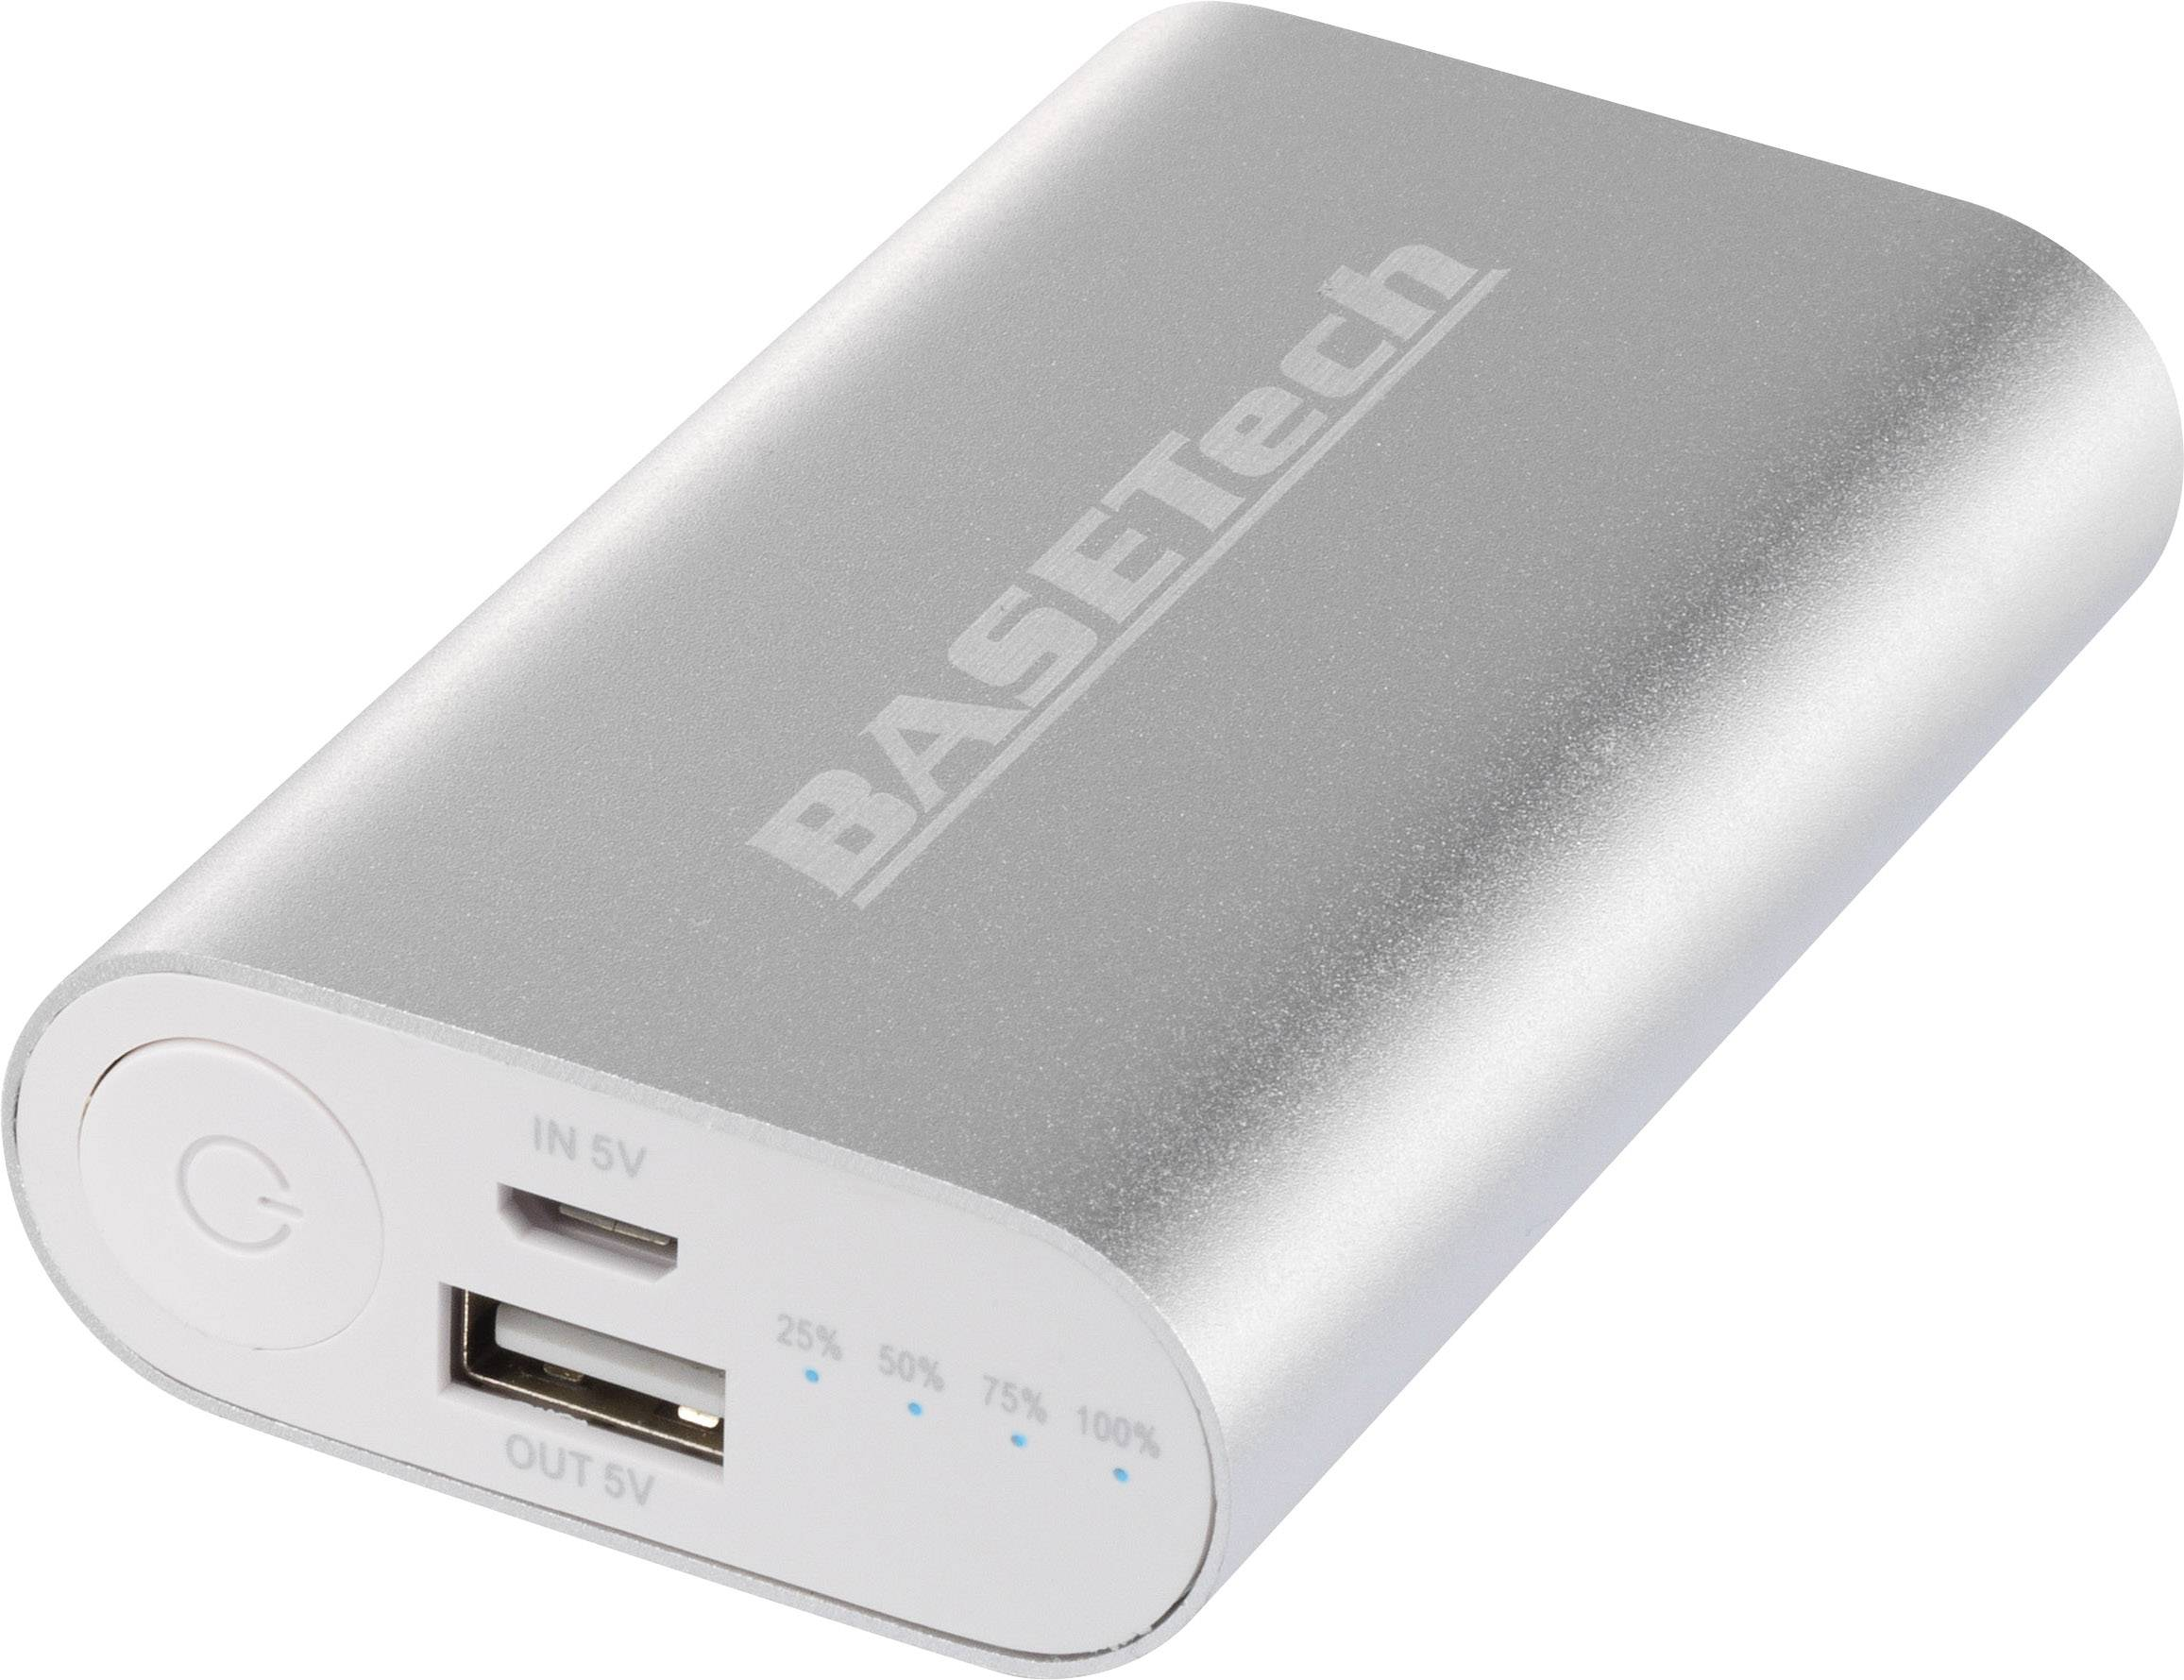 Powerbanka Basetech BTP-2, Li-Ion akumulátor 5200 mAh, strieborná/biela